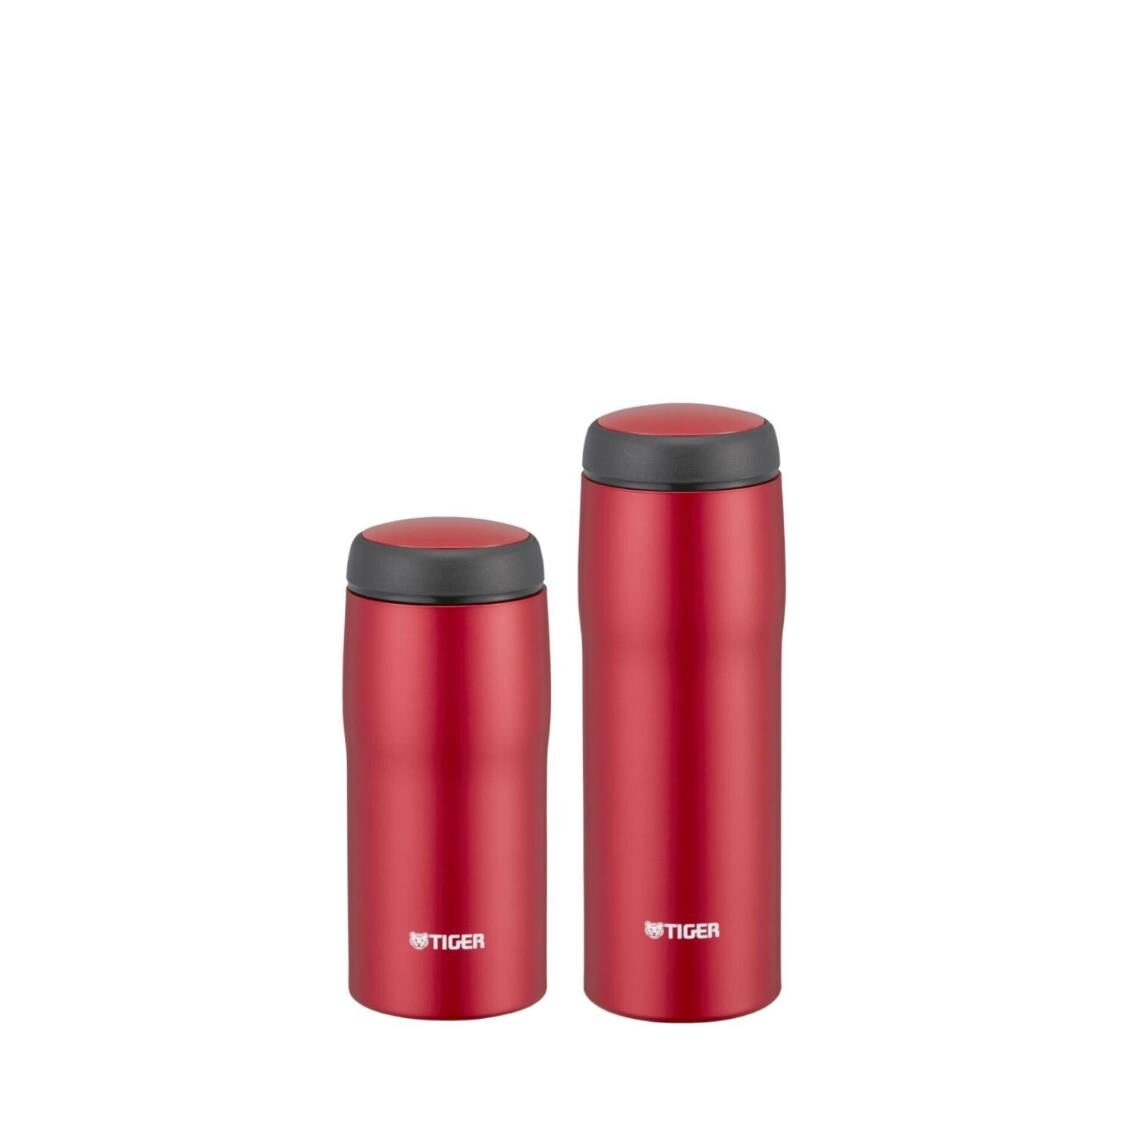 Tiger Bundle - 360ml  480ml Double Stainless Steel Mug Set Matte Red